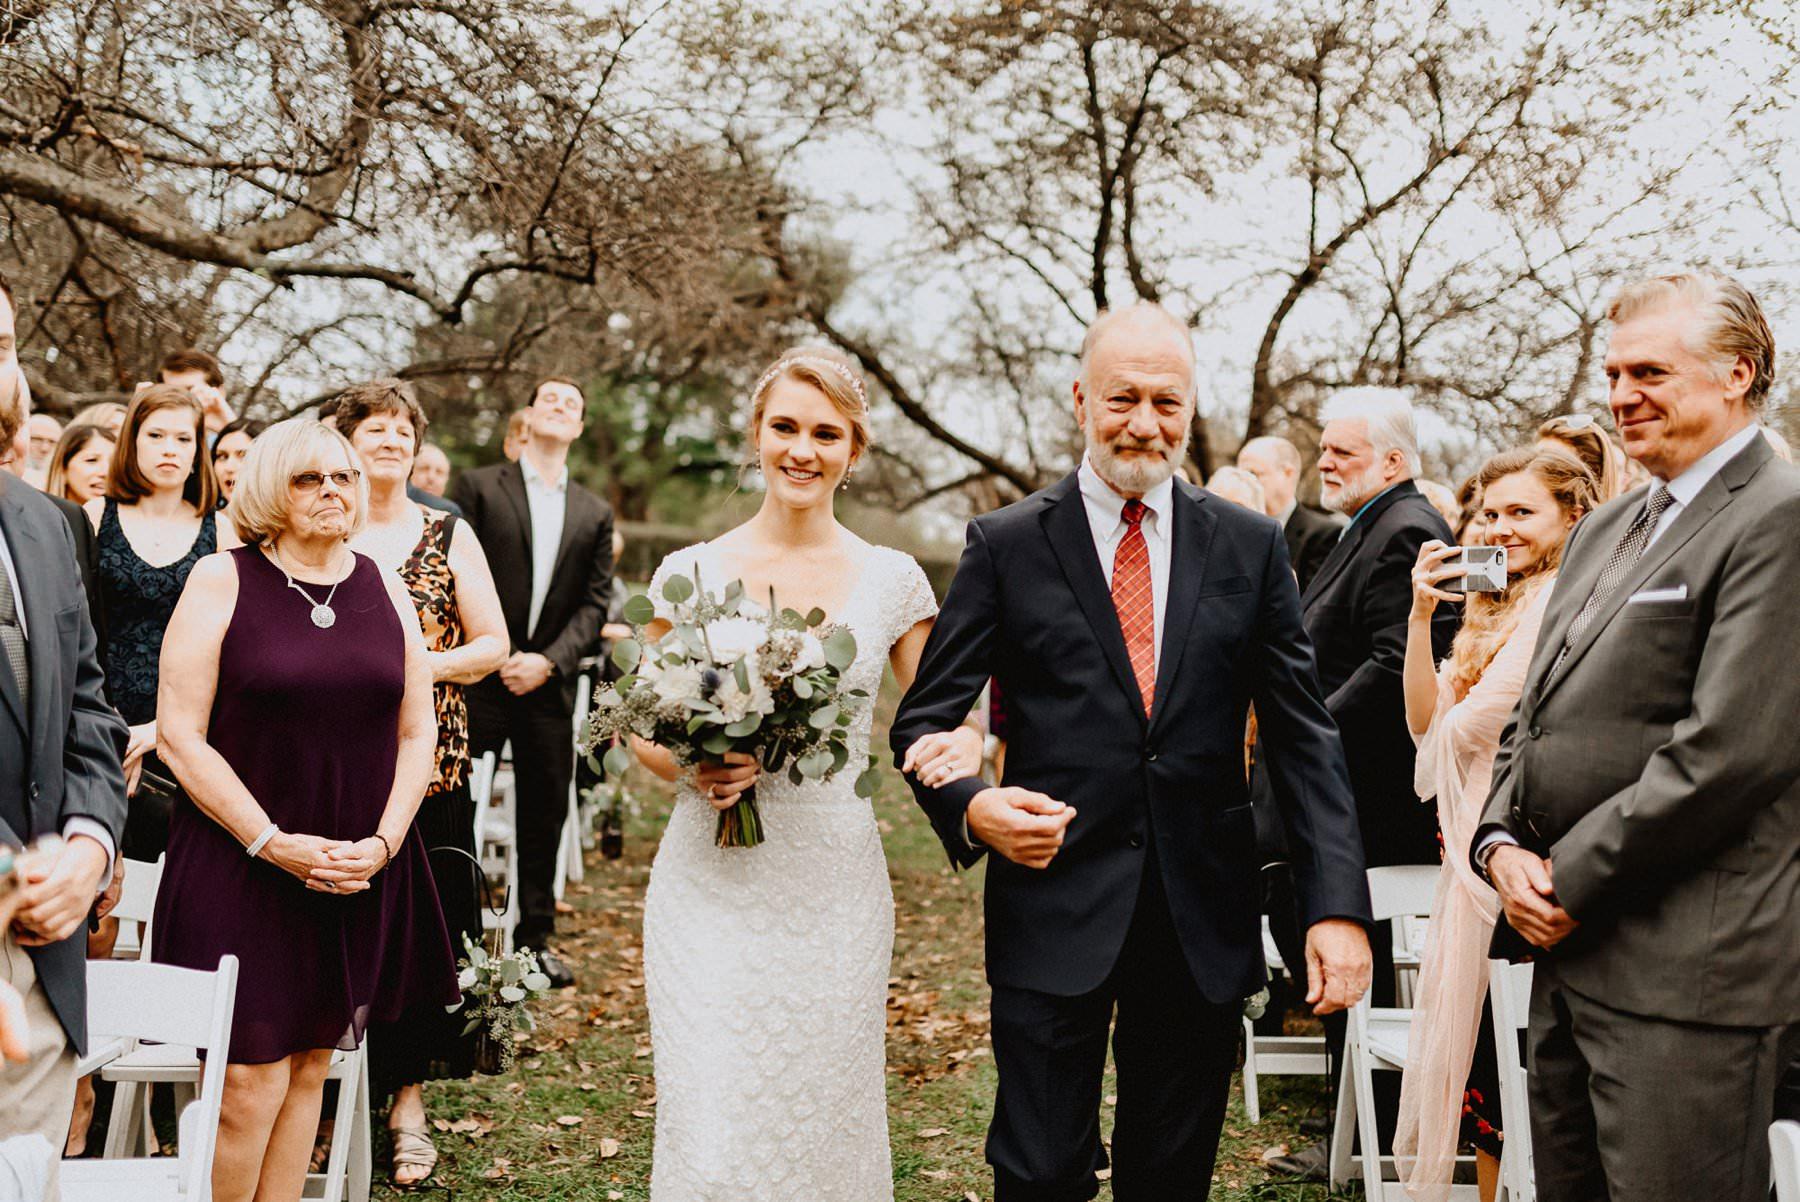 John_James_Audubon_Center_wedding-42.jpg